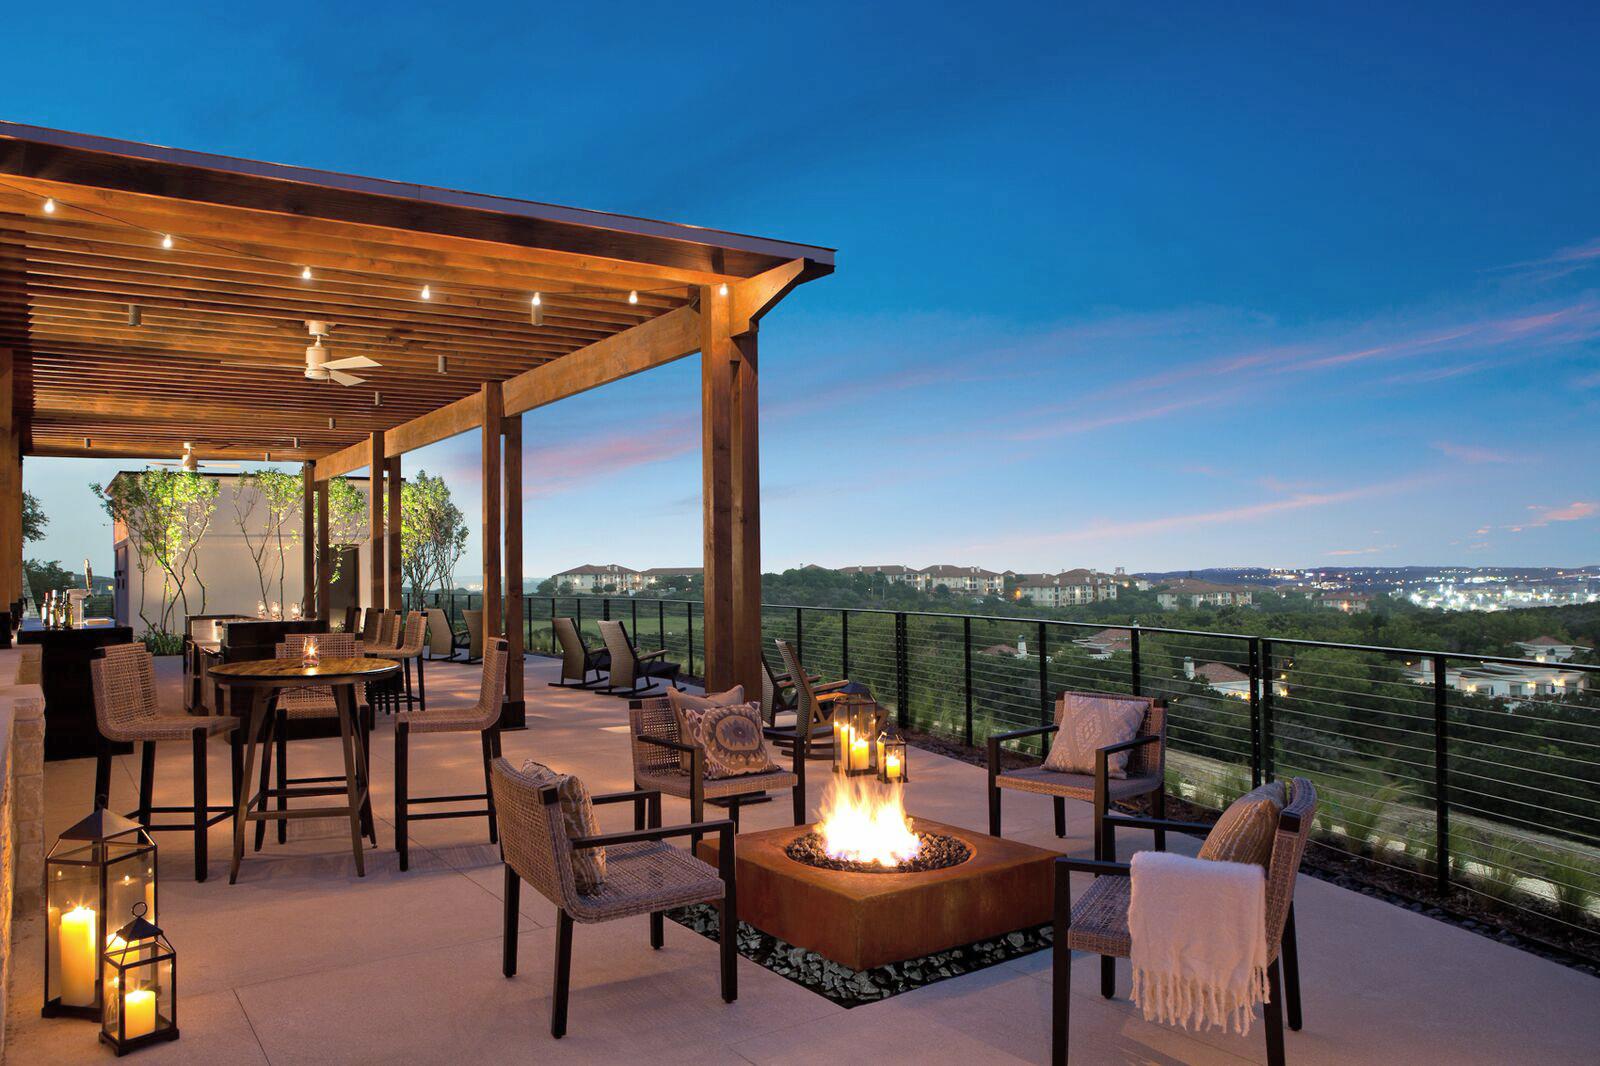 La Cantera Hill Country Resort_San Antonio TX_Hotel_City View Terrace.jpg